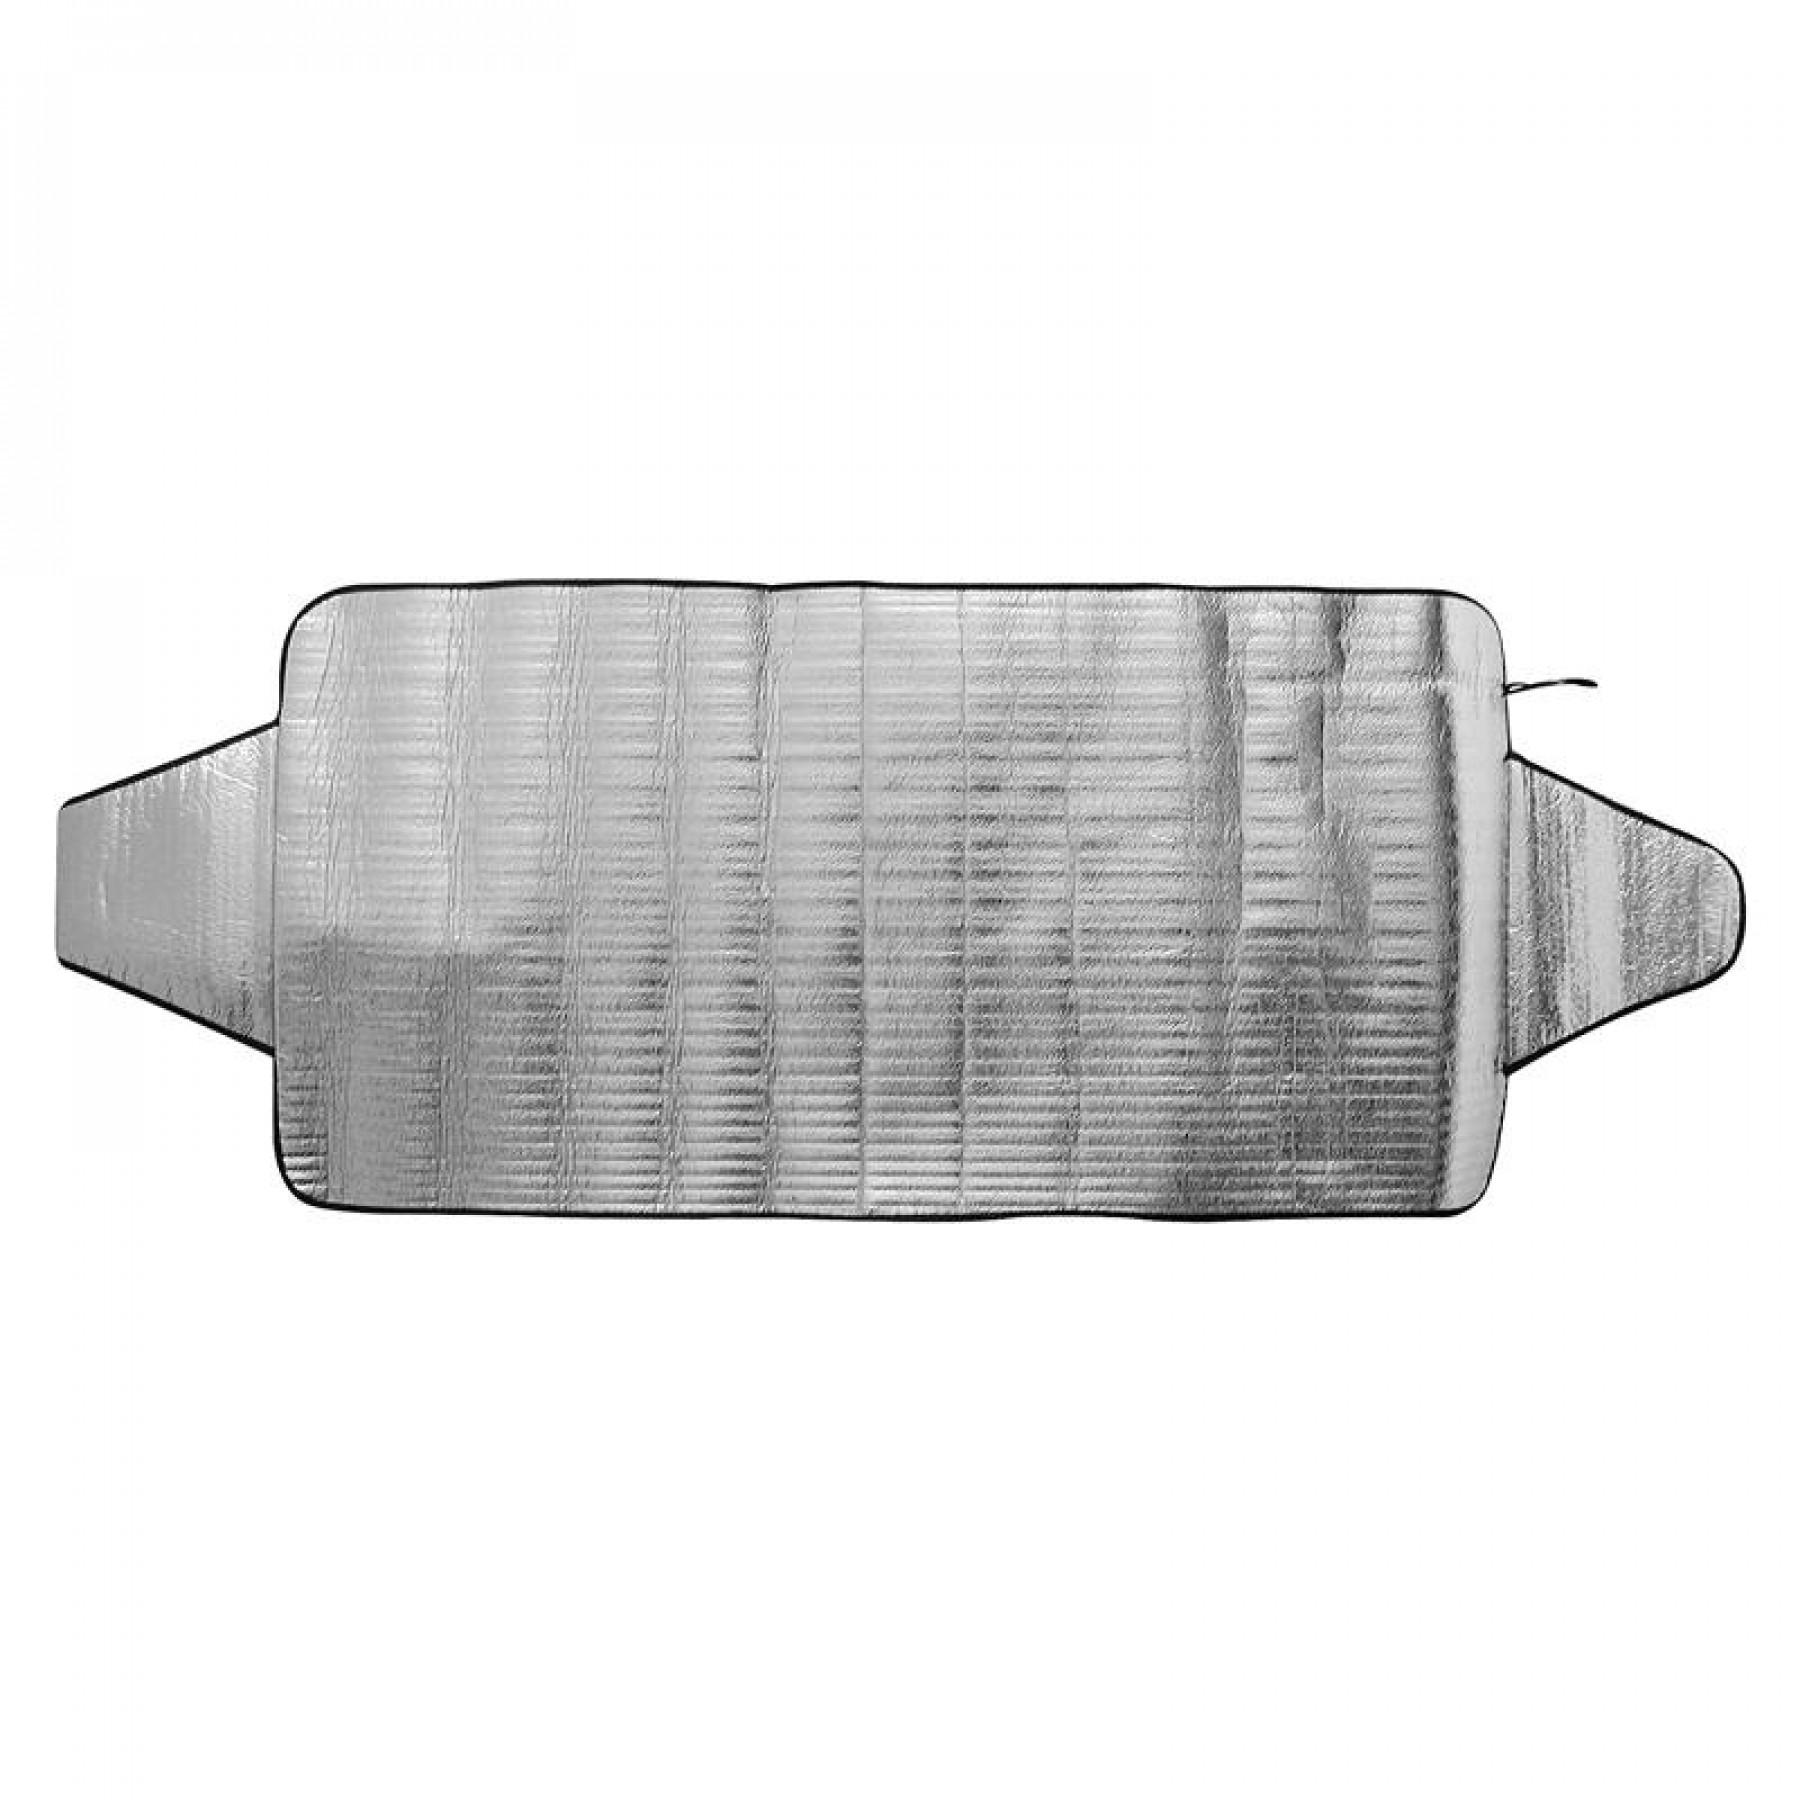 Ruit folie / ijsdeken 70 x 140 cm (standaard)